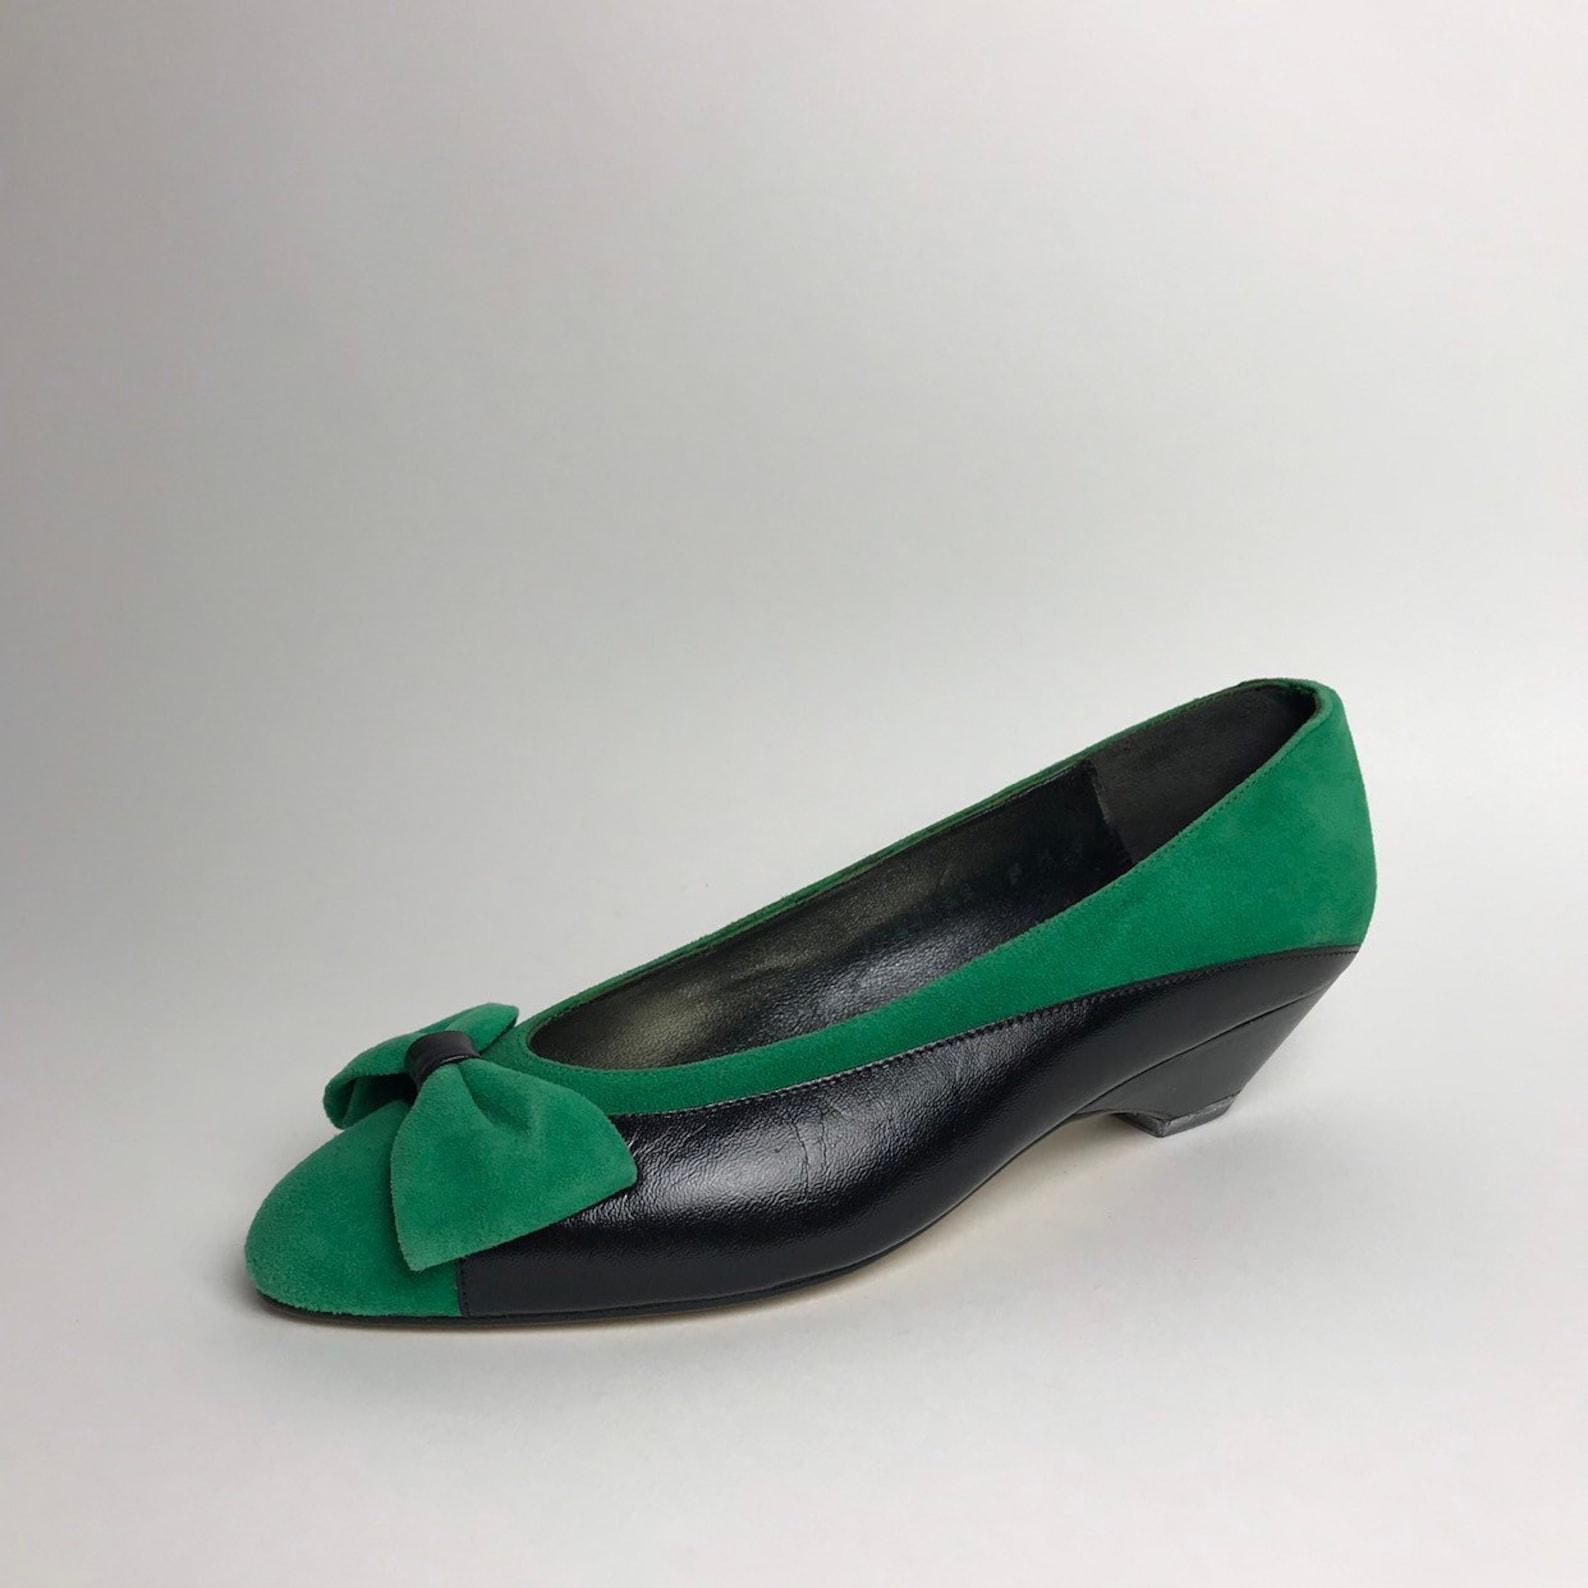 vintage pumps / pointed toe flats / vintage shoes / bow shoes / bow pumps / plack pumps / green pumps / leather ballet flats / s